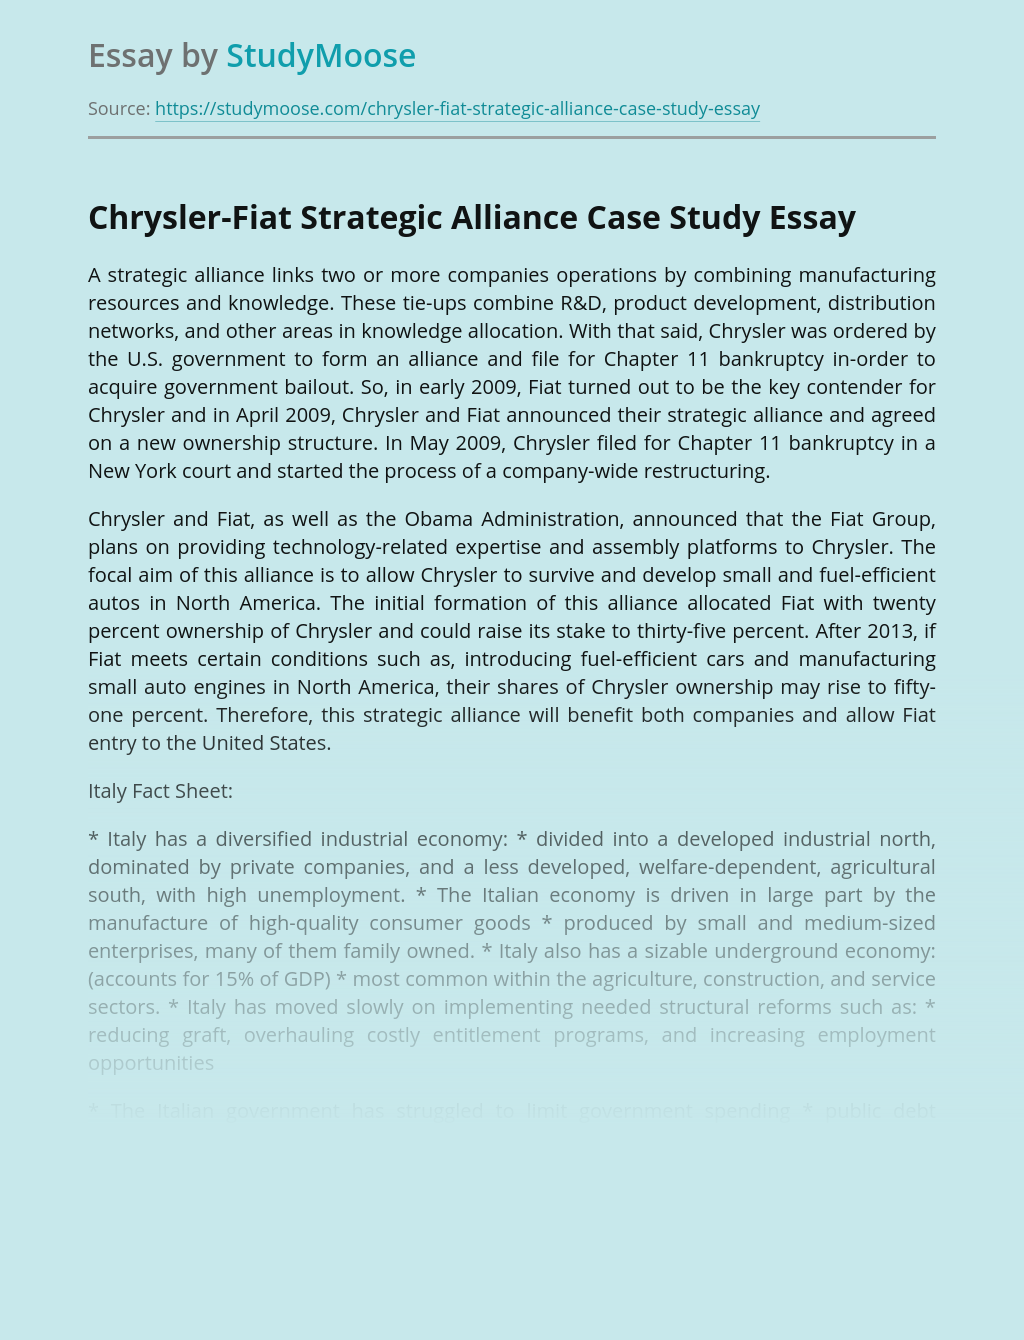 Chrysler-Fiat Strategic Alliance Case Study